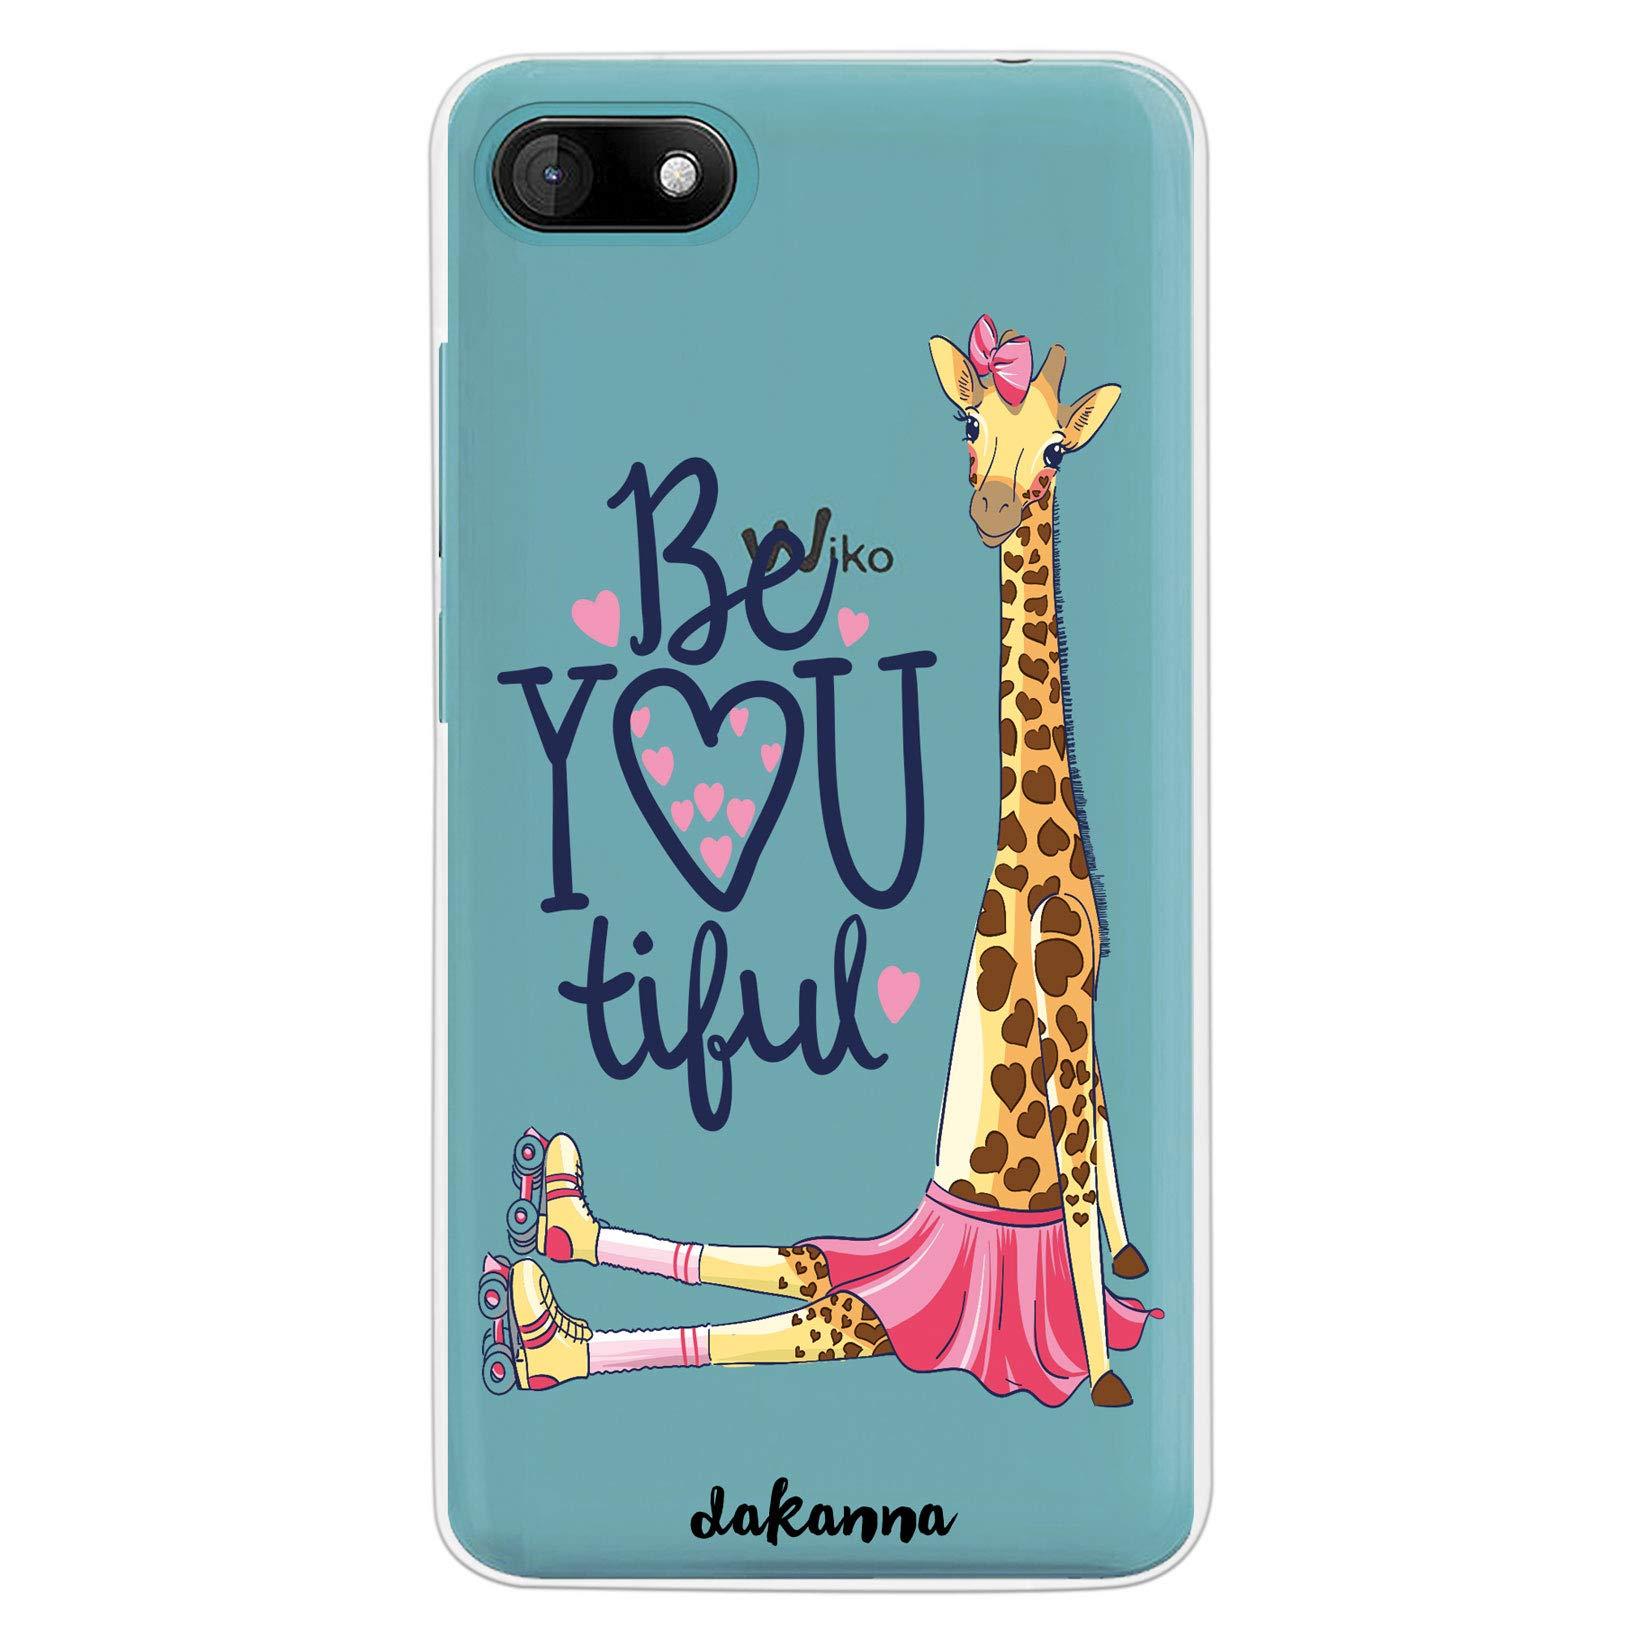 dakanna Funda para [Wiko Sunny 3] de Silicona Flexible, Dibujo Diseño [Girafa con Patines, Corazones y Frase Be You Tiful], Color [Fondo Transparente] Carcasa Case Cover de Gel TPU para Smartphone: Amazon.es: